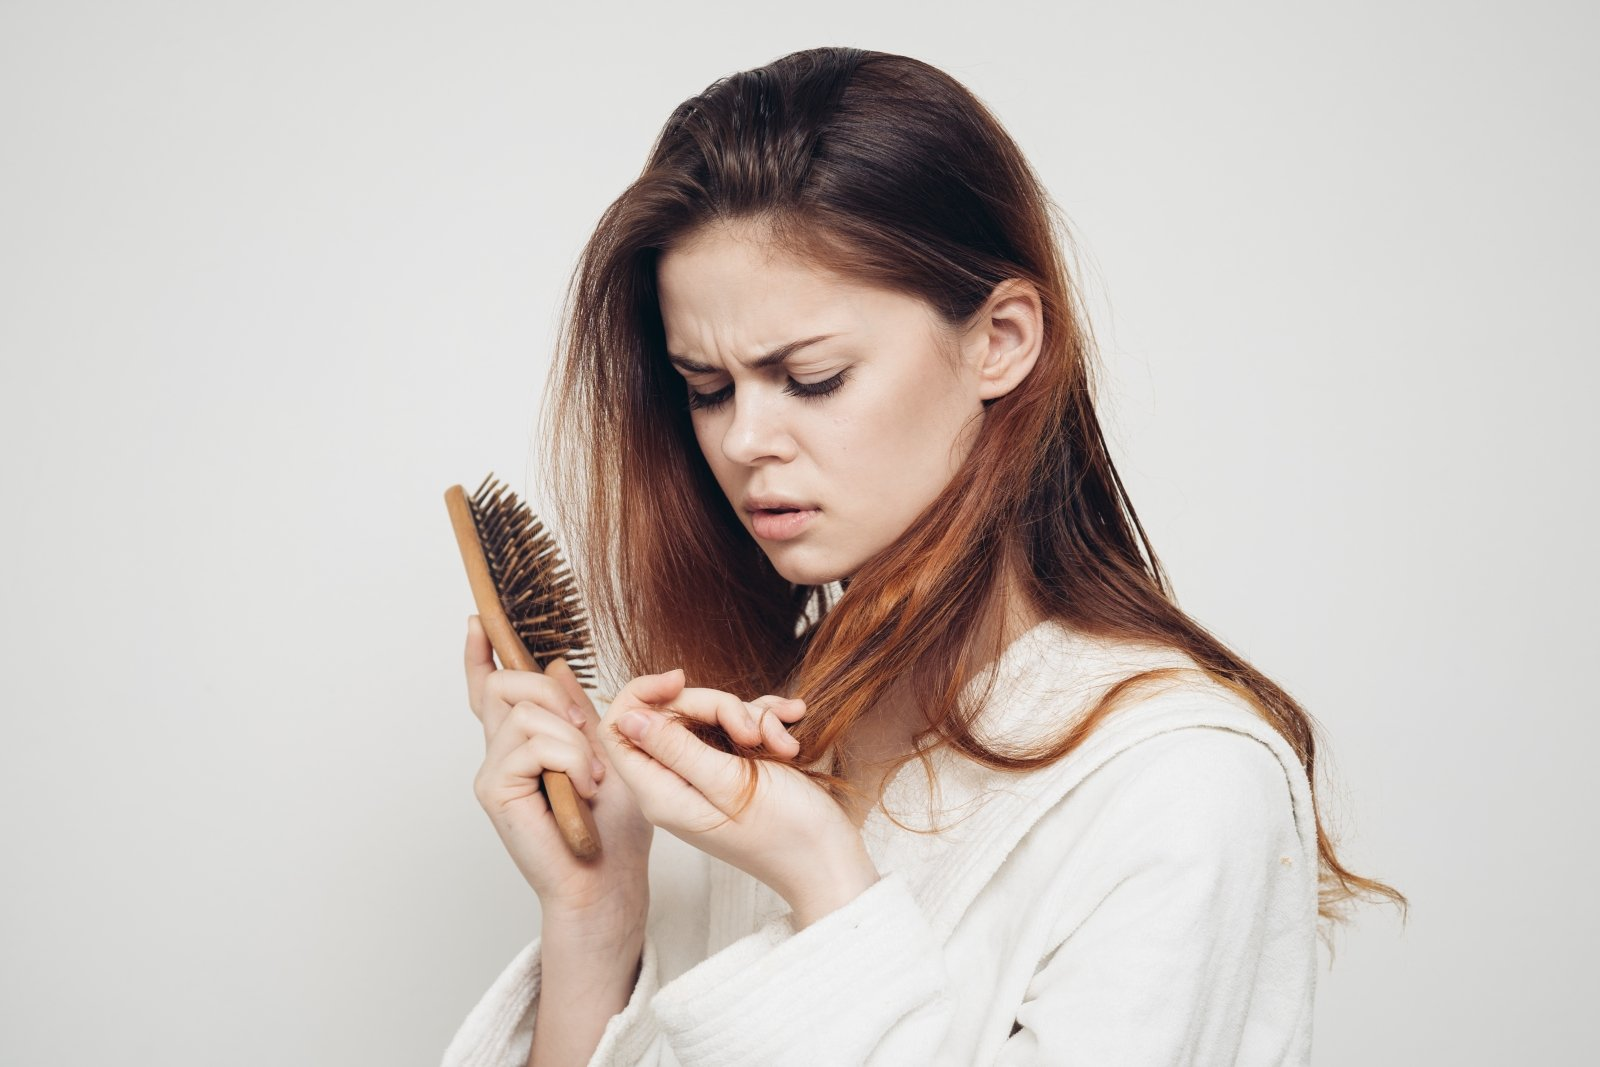 plaukų ir širdies sveikata